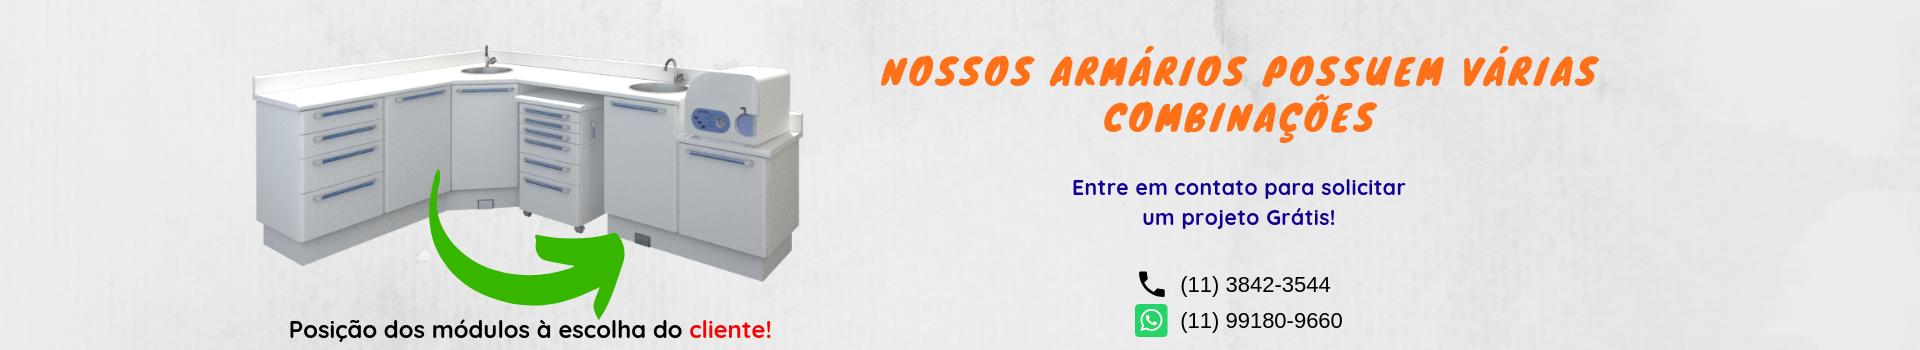 Armário Odontológico Planejado 06 - 1 80 x 3 00m